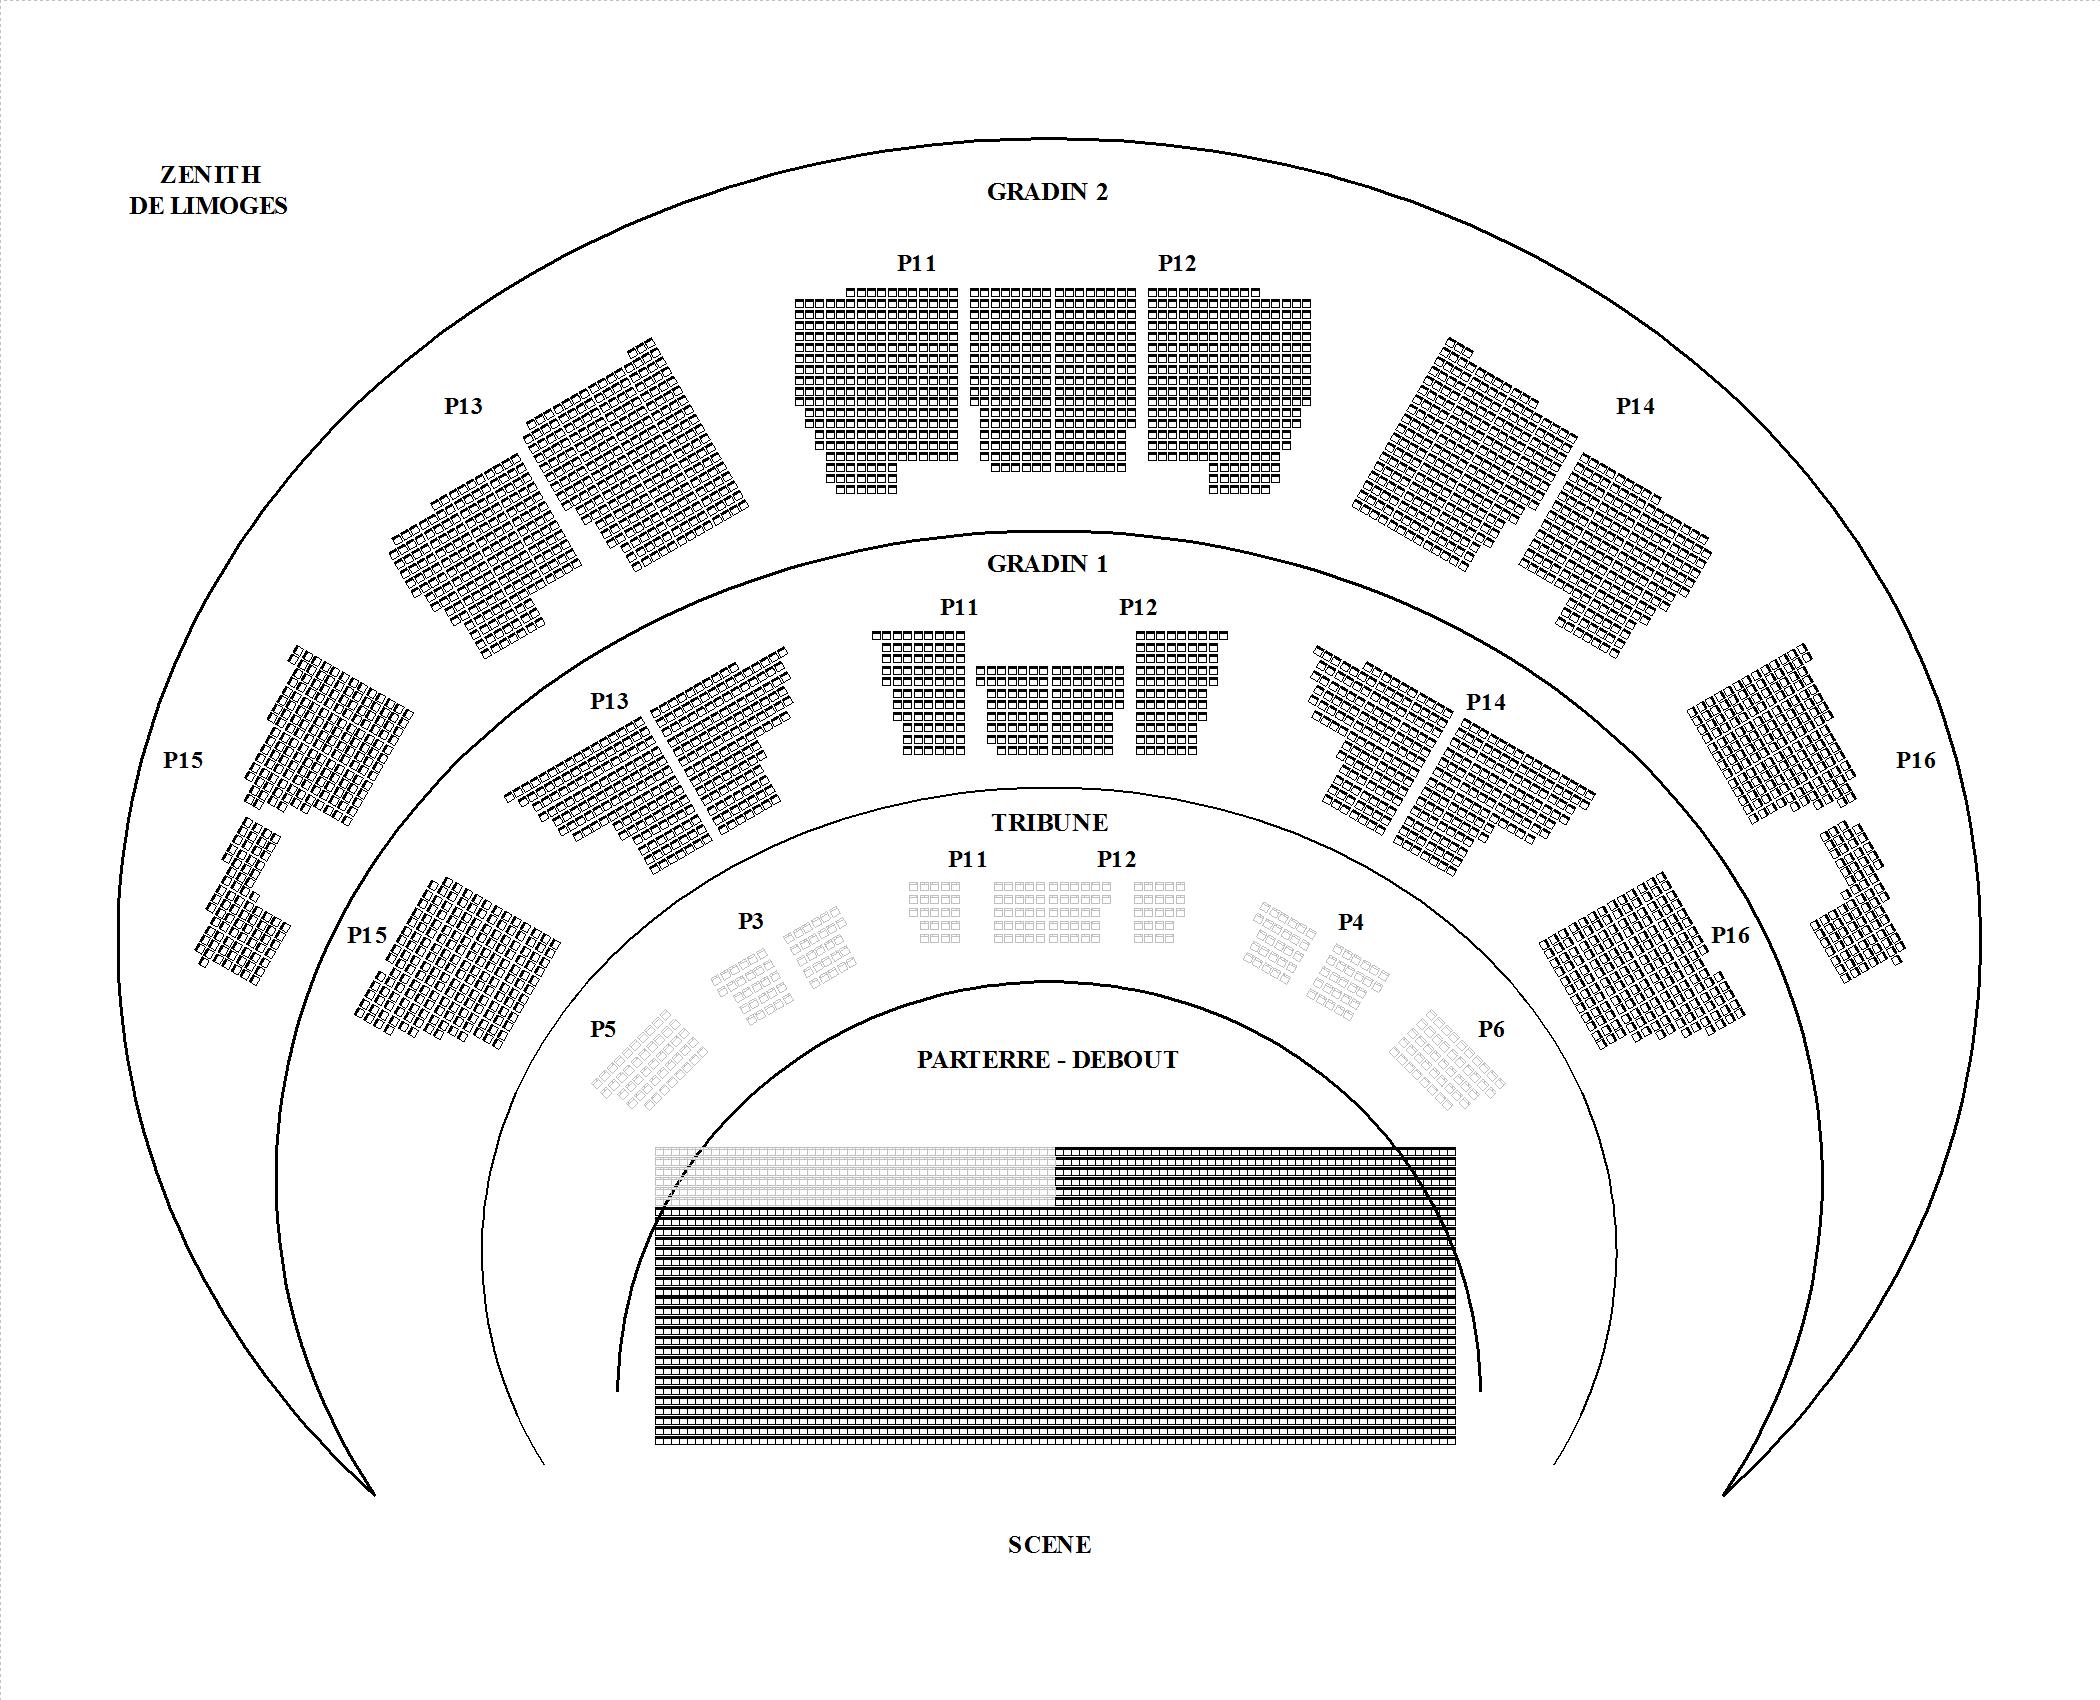 SHAKA PONK - ZENITH - LIMOGES: Billets pas chers et Tickets